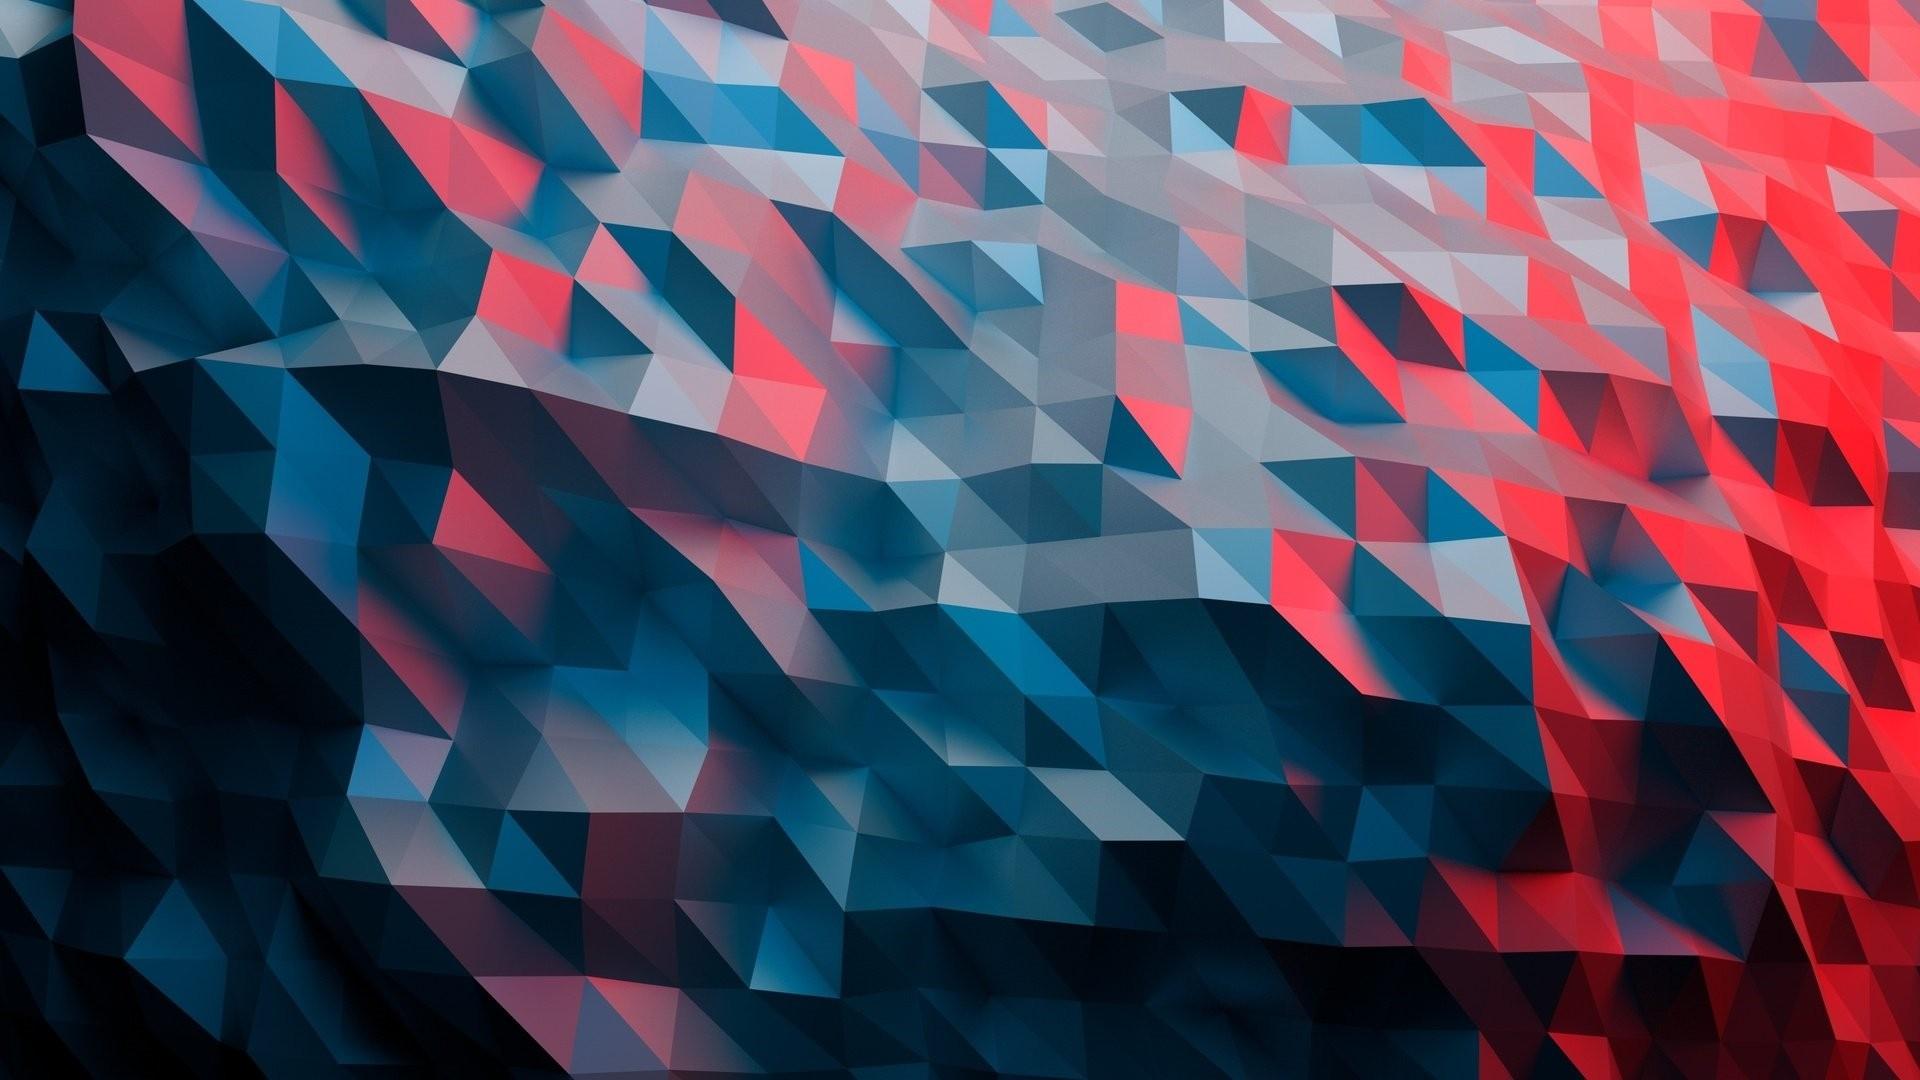 Geometric hd wallpaper download